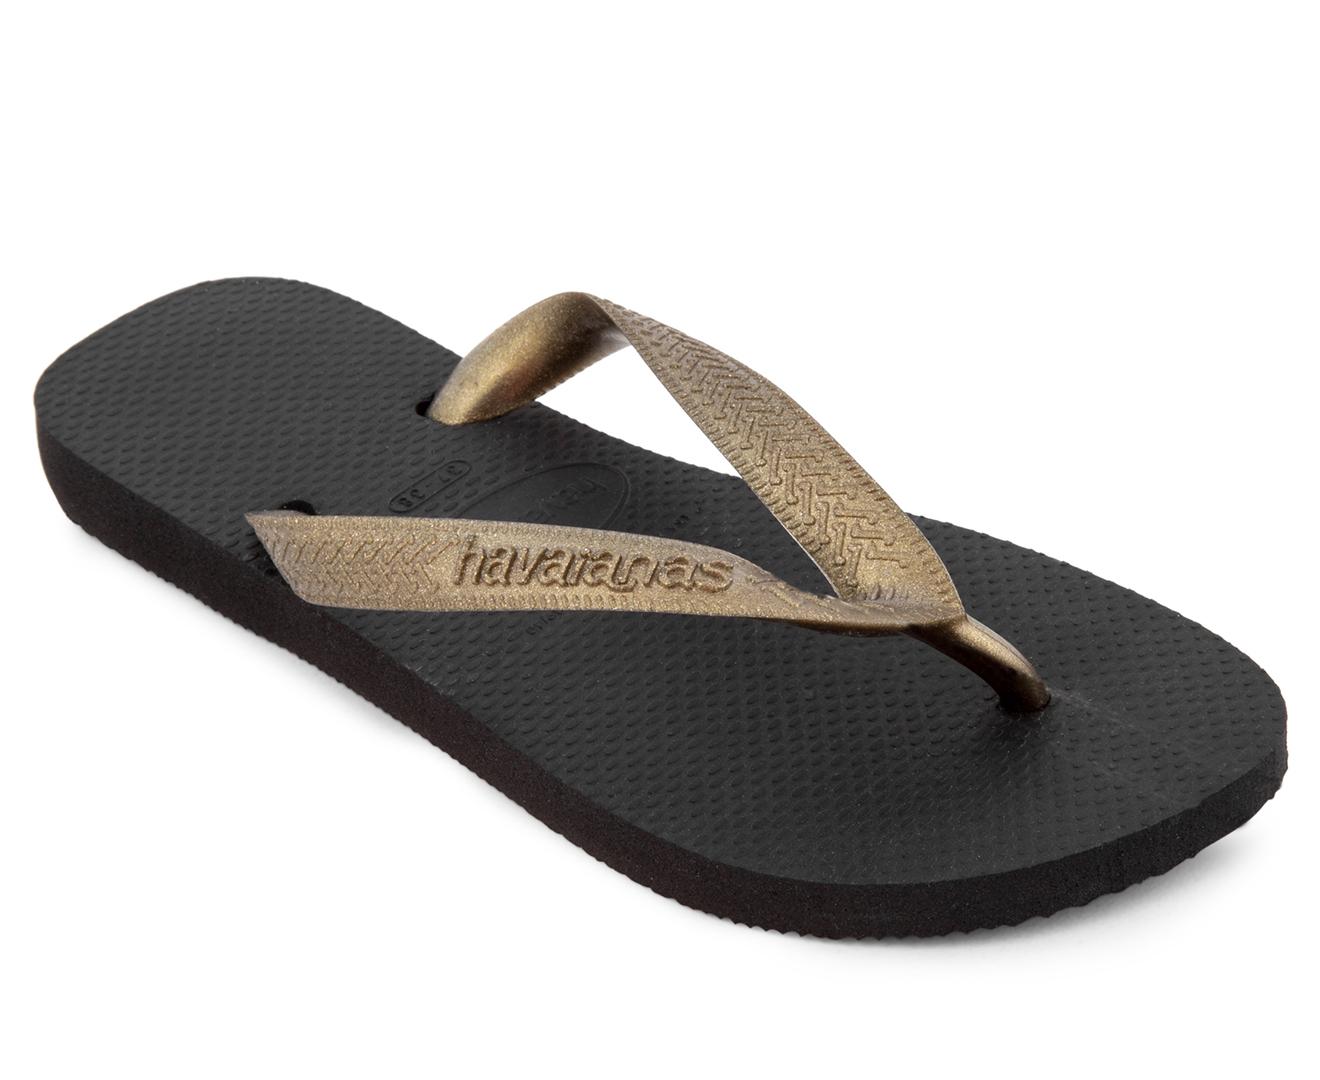 303dd950141eb Havaianas Top Tiras CF Thongs - Black Golden